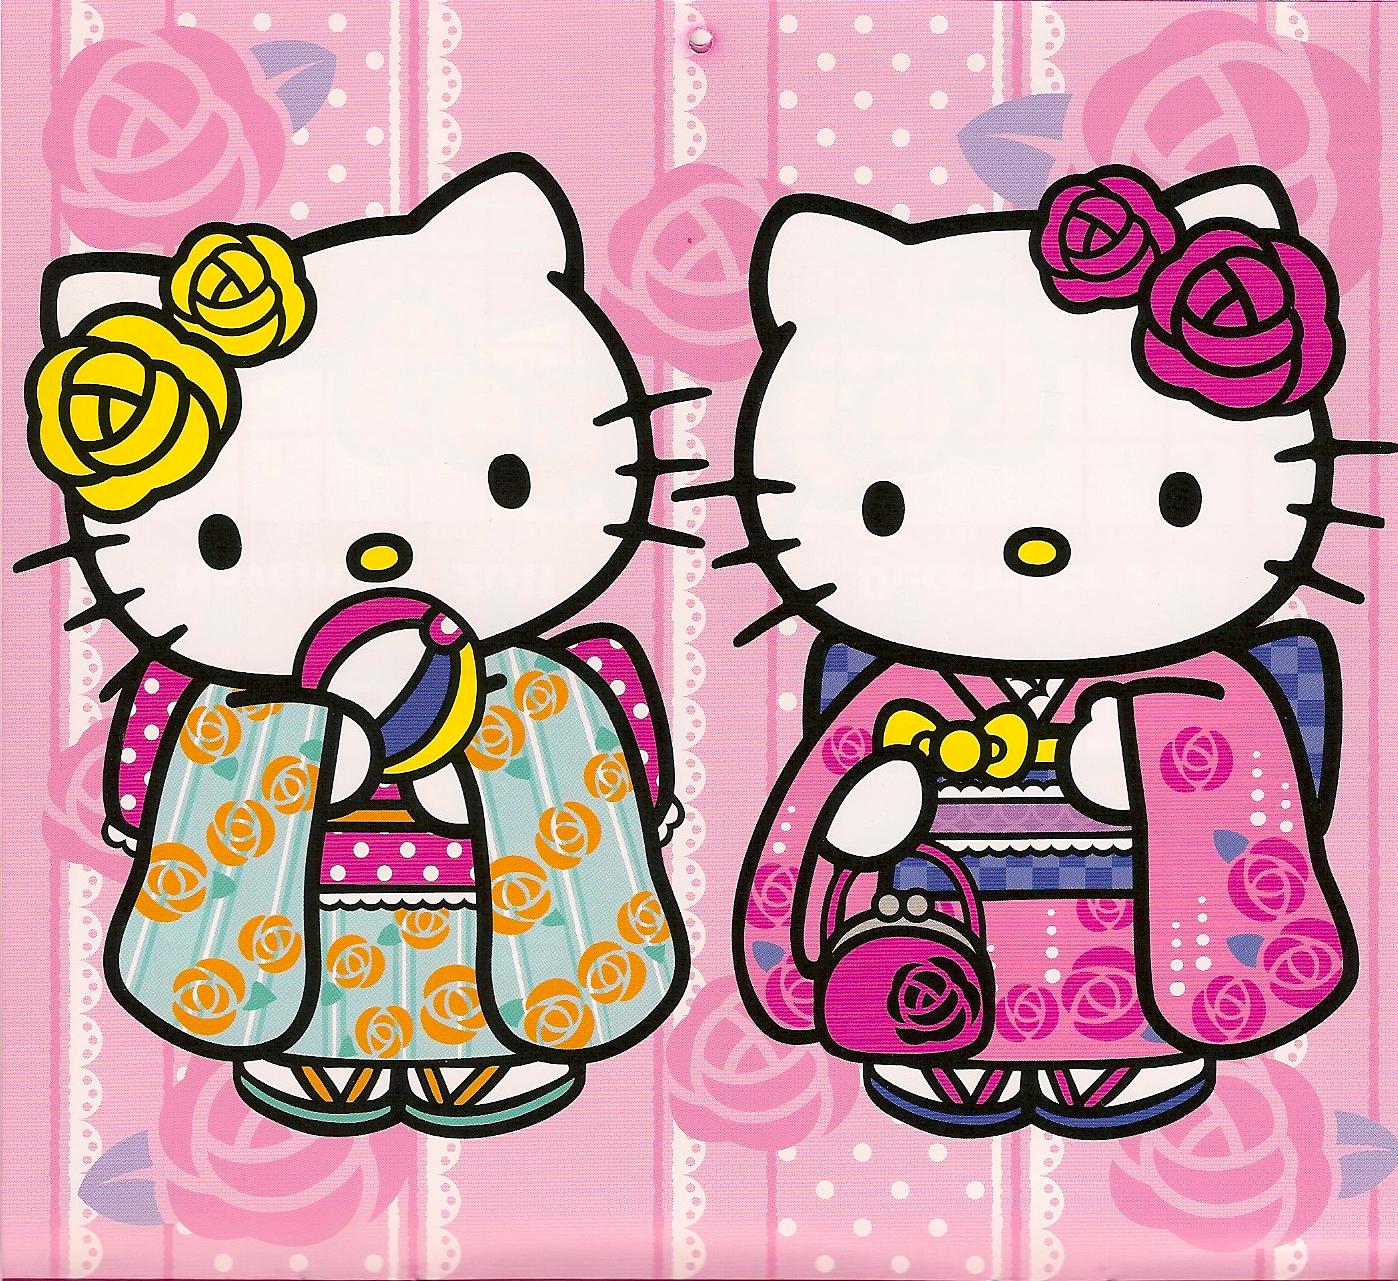 New Hello Kitty Wallpaper  WallpaperSafari